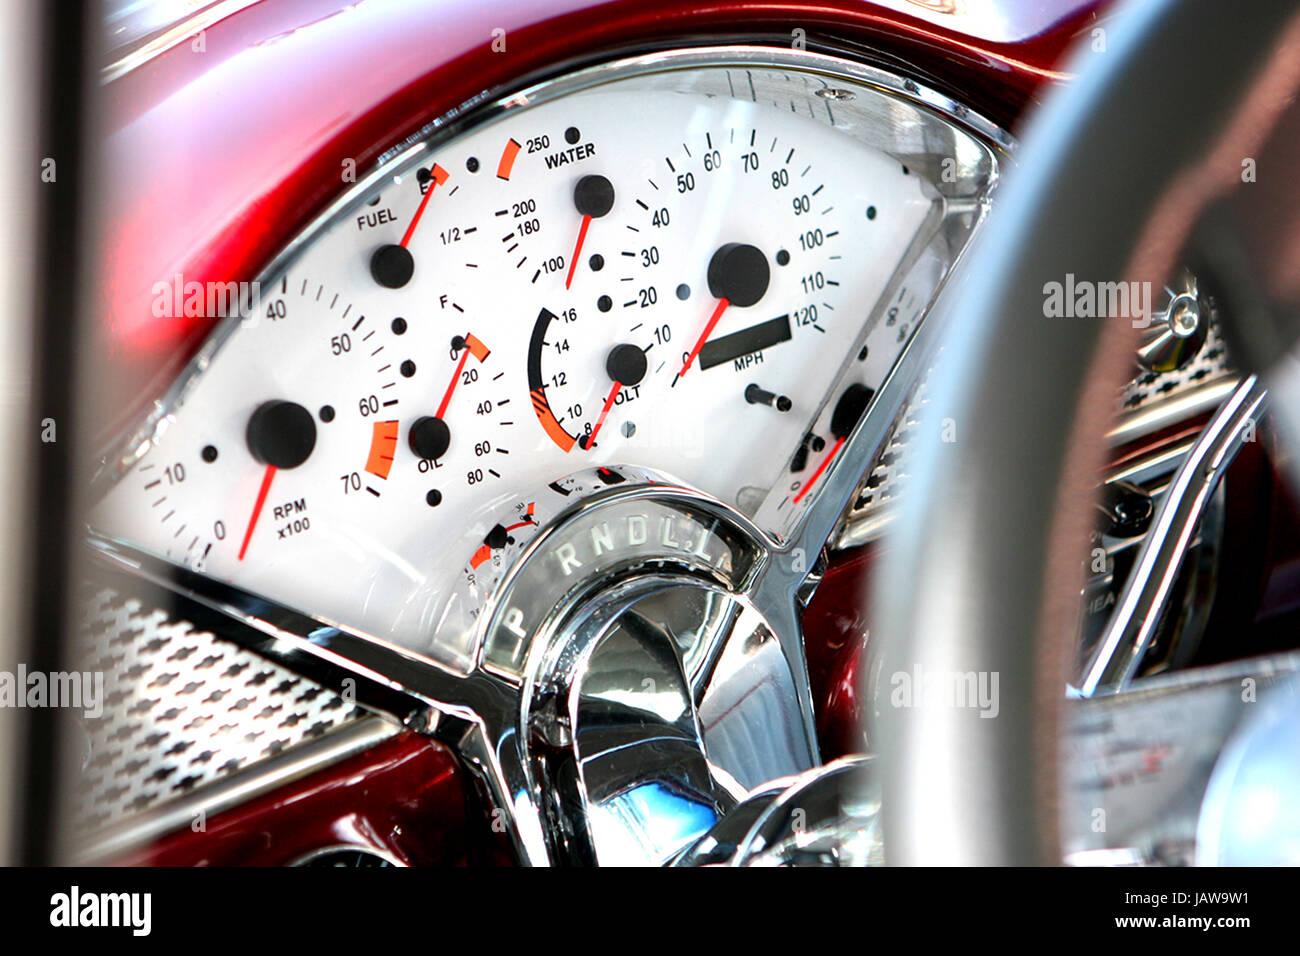 Carburator Stockfotos & Carburator Bilder - Alamy